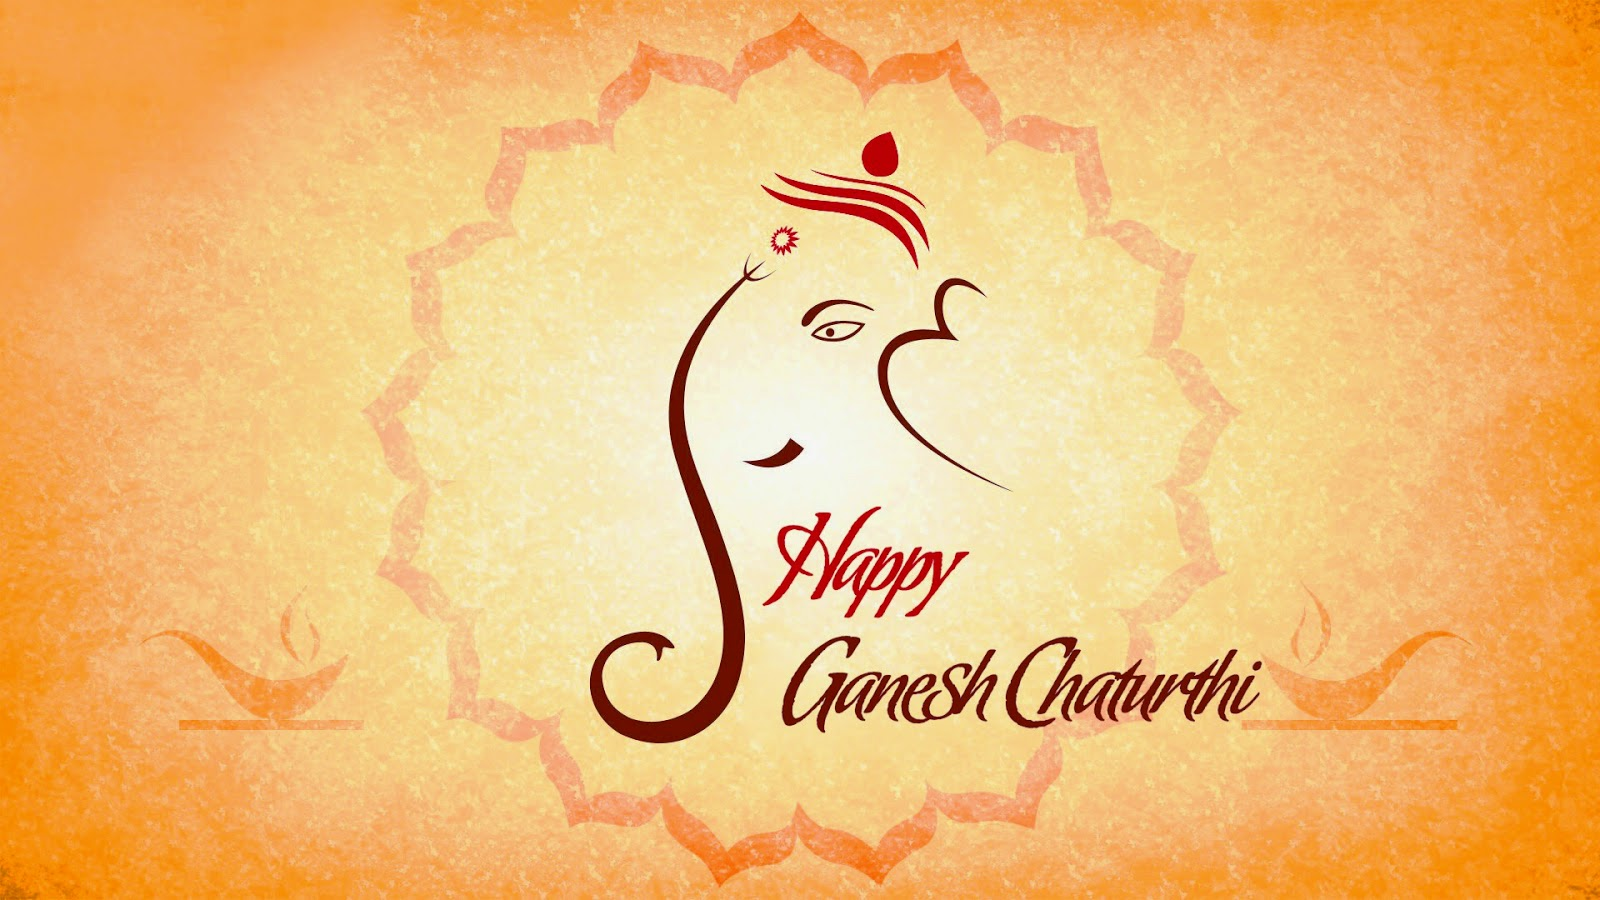 Ganpati Bappa Wallpaper Hd 3d श्री Happy Ganesh Chaturthi Images And Wallpapers 2016